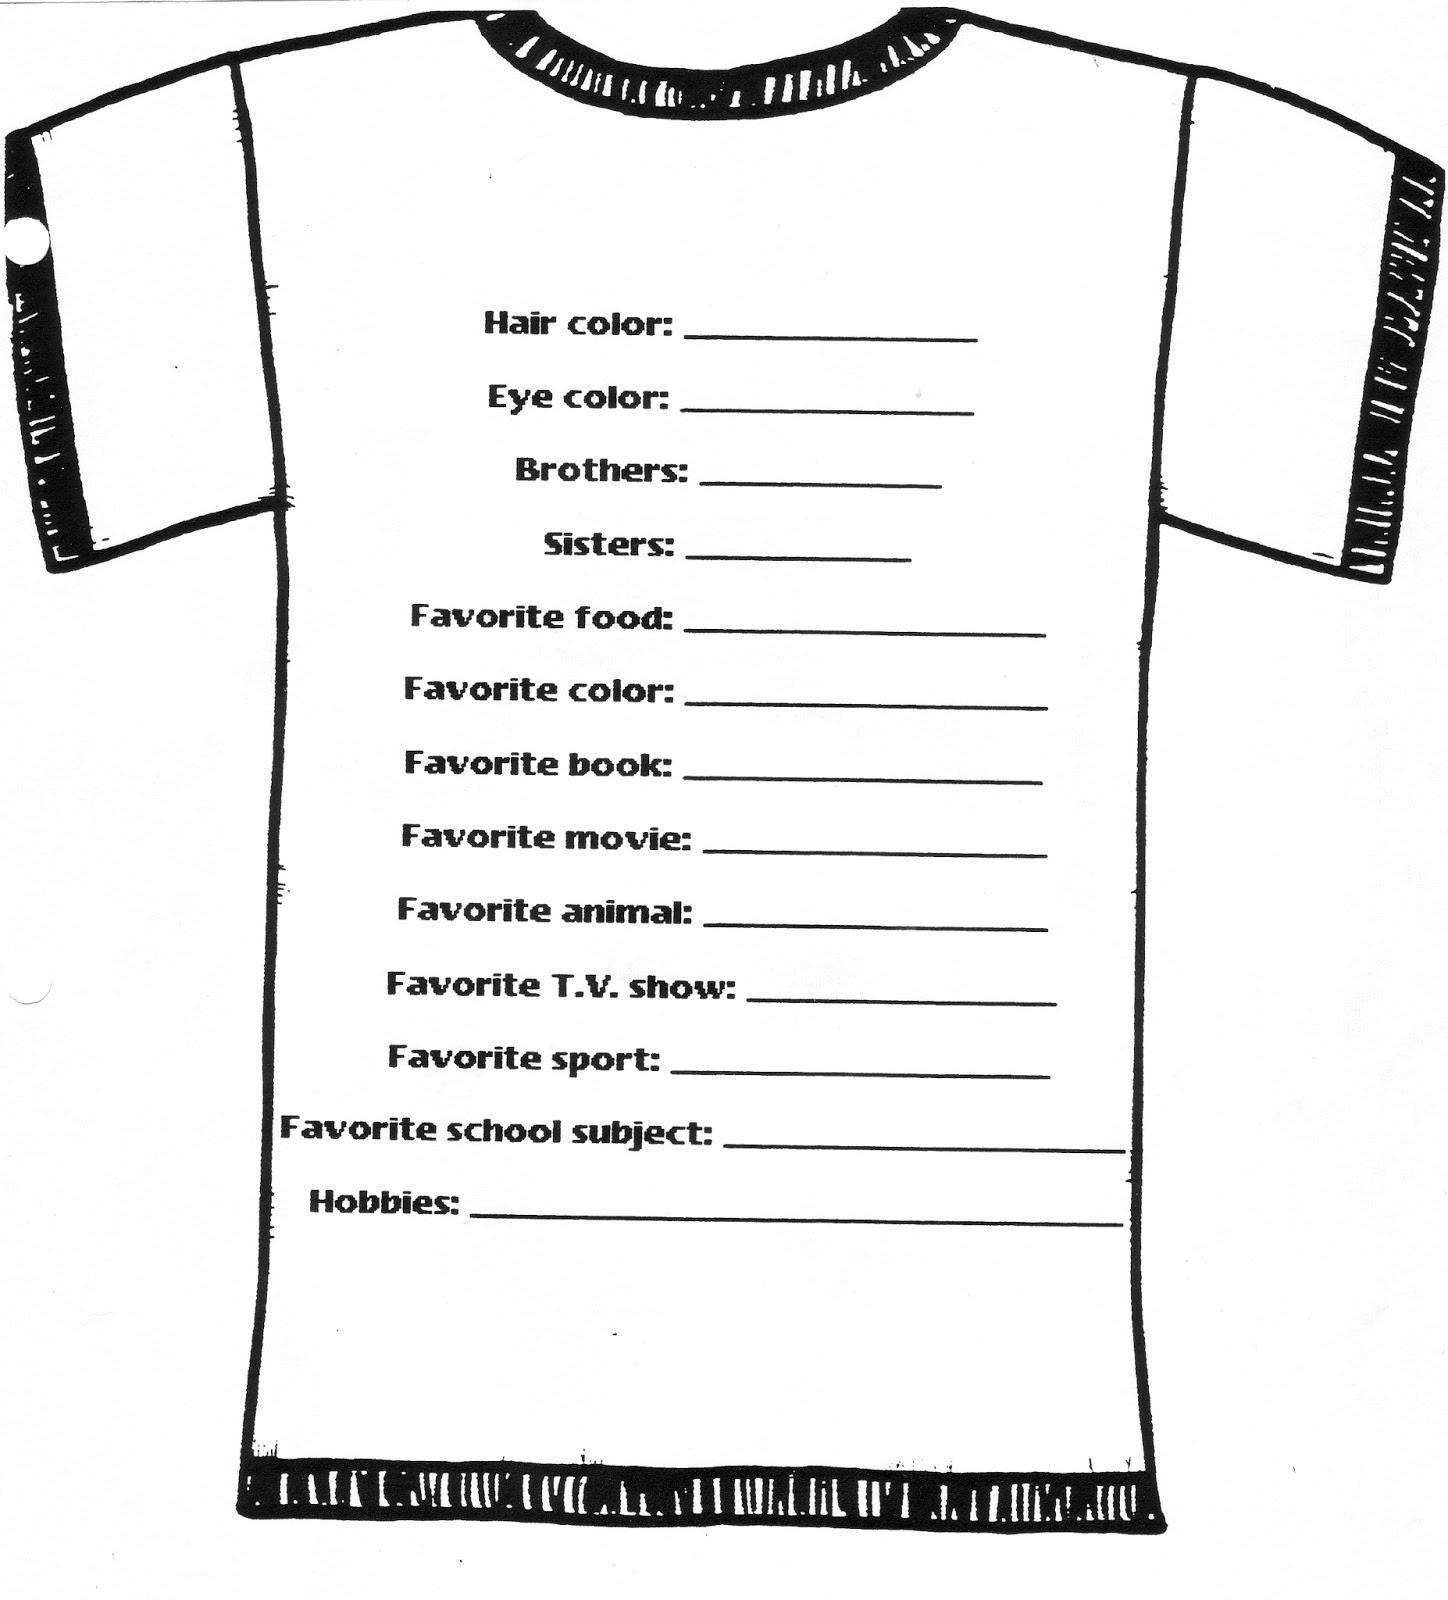 T Shirt Design Template For Microsoft Word Anlis